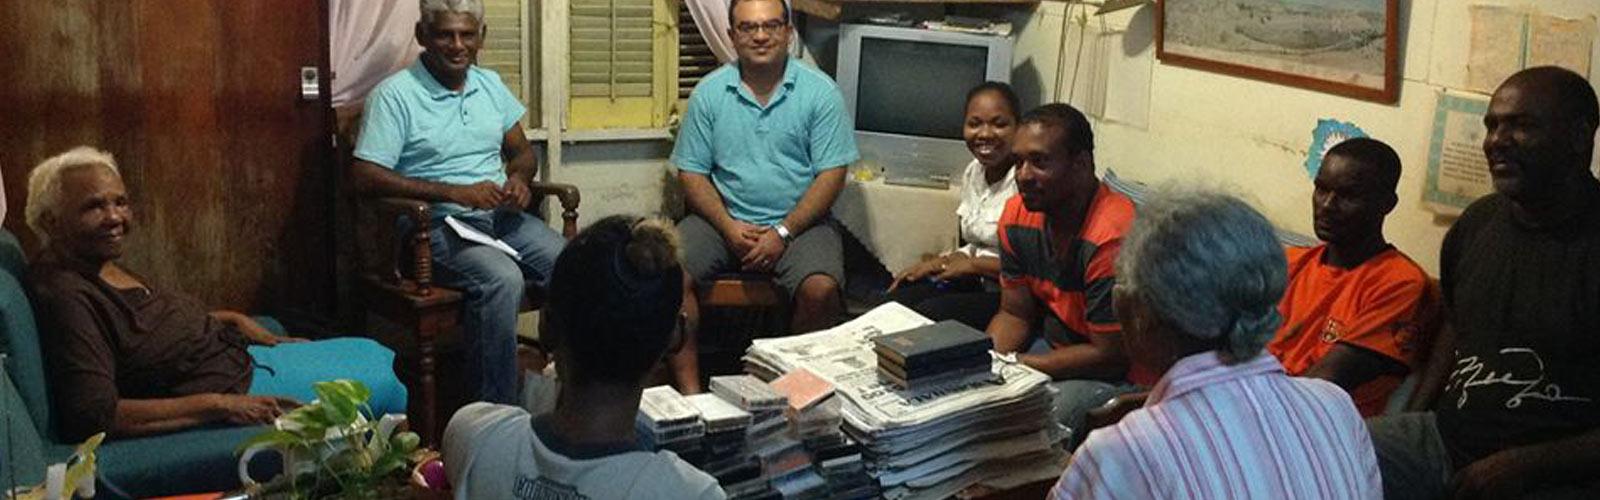 Belize Baha'i Study Circles